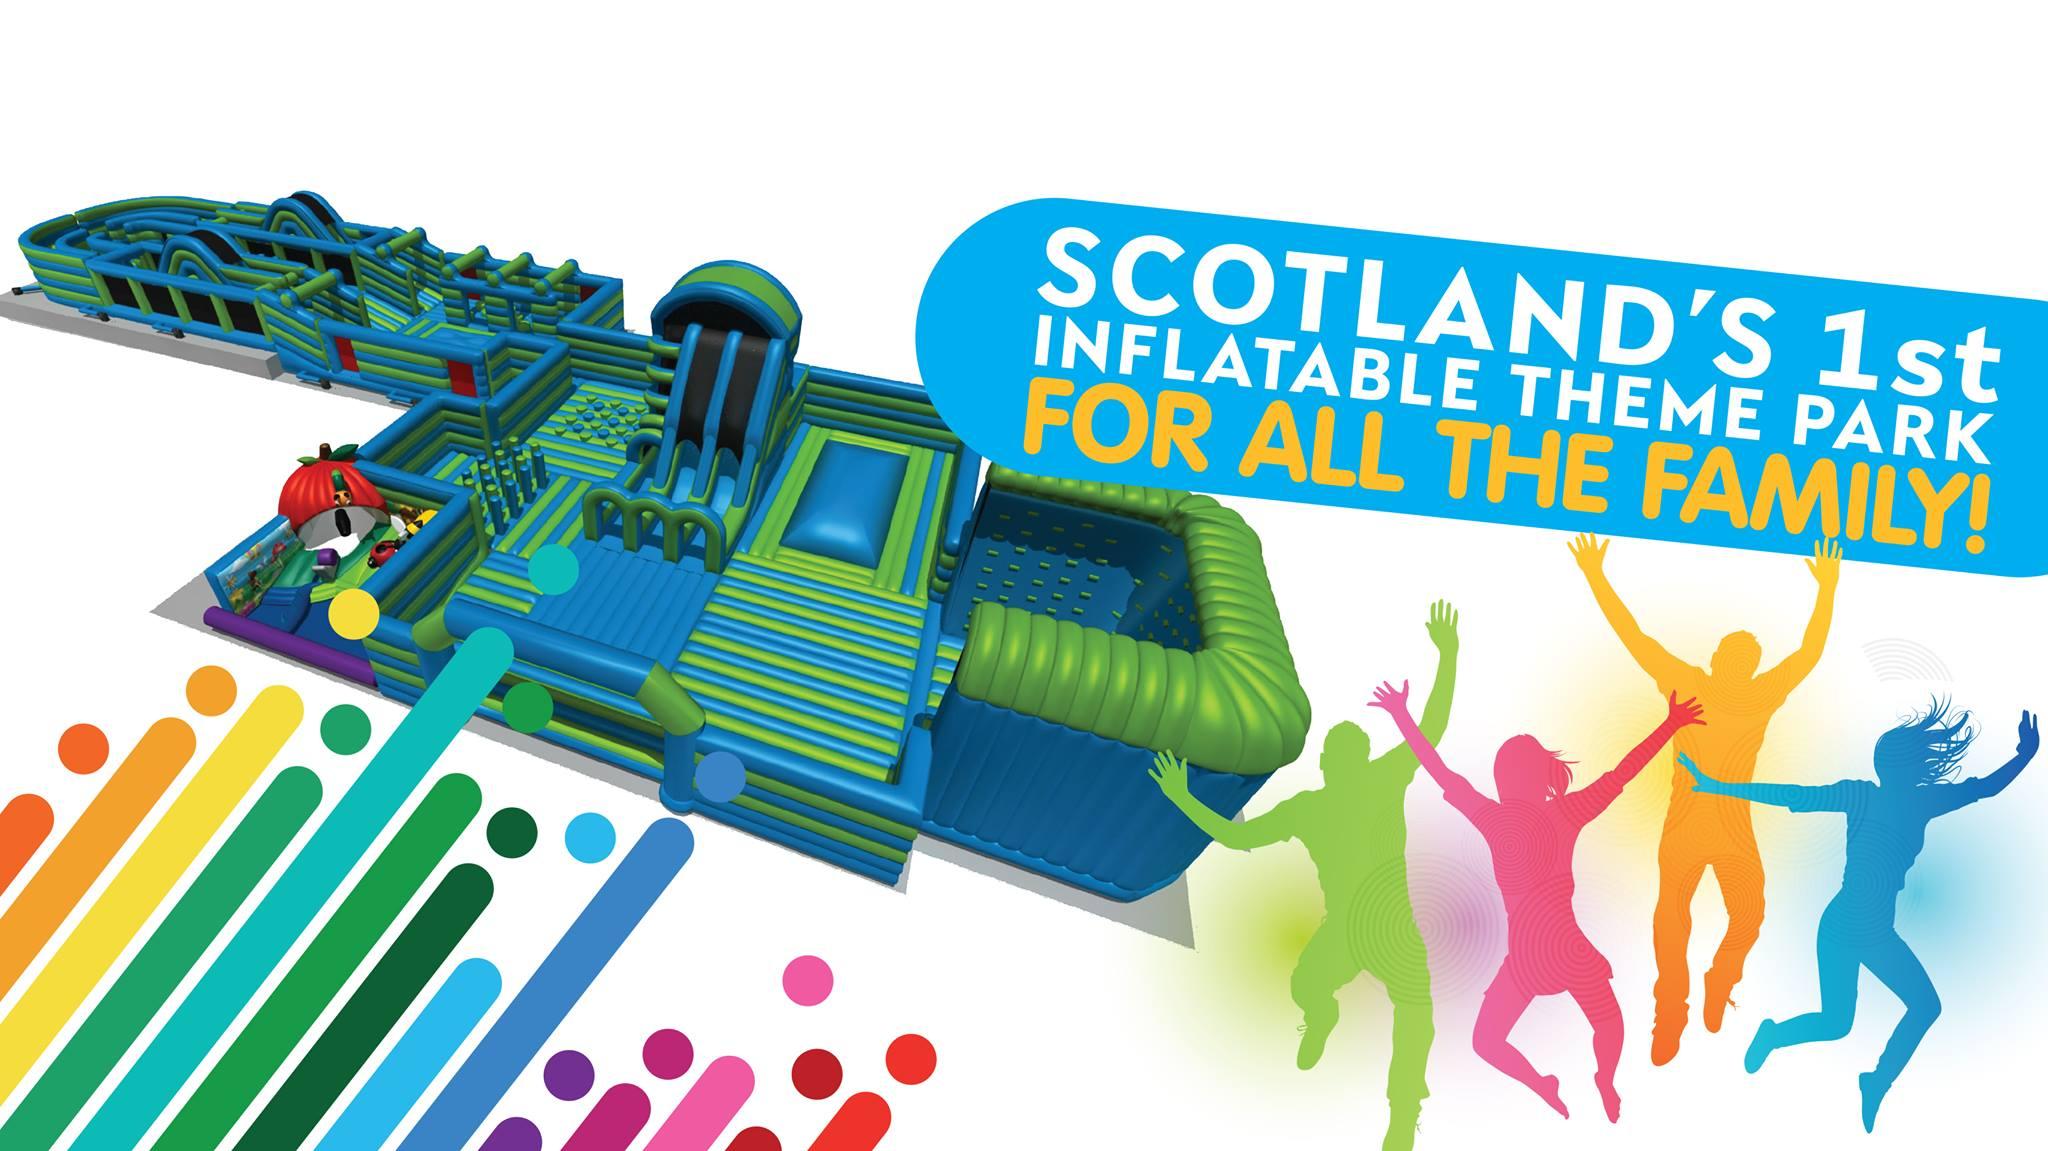 Scotland's 1st Inflatable Theme Park